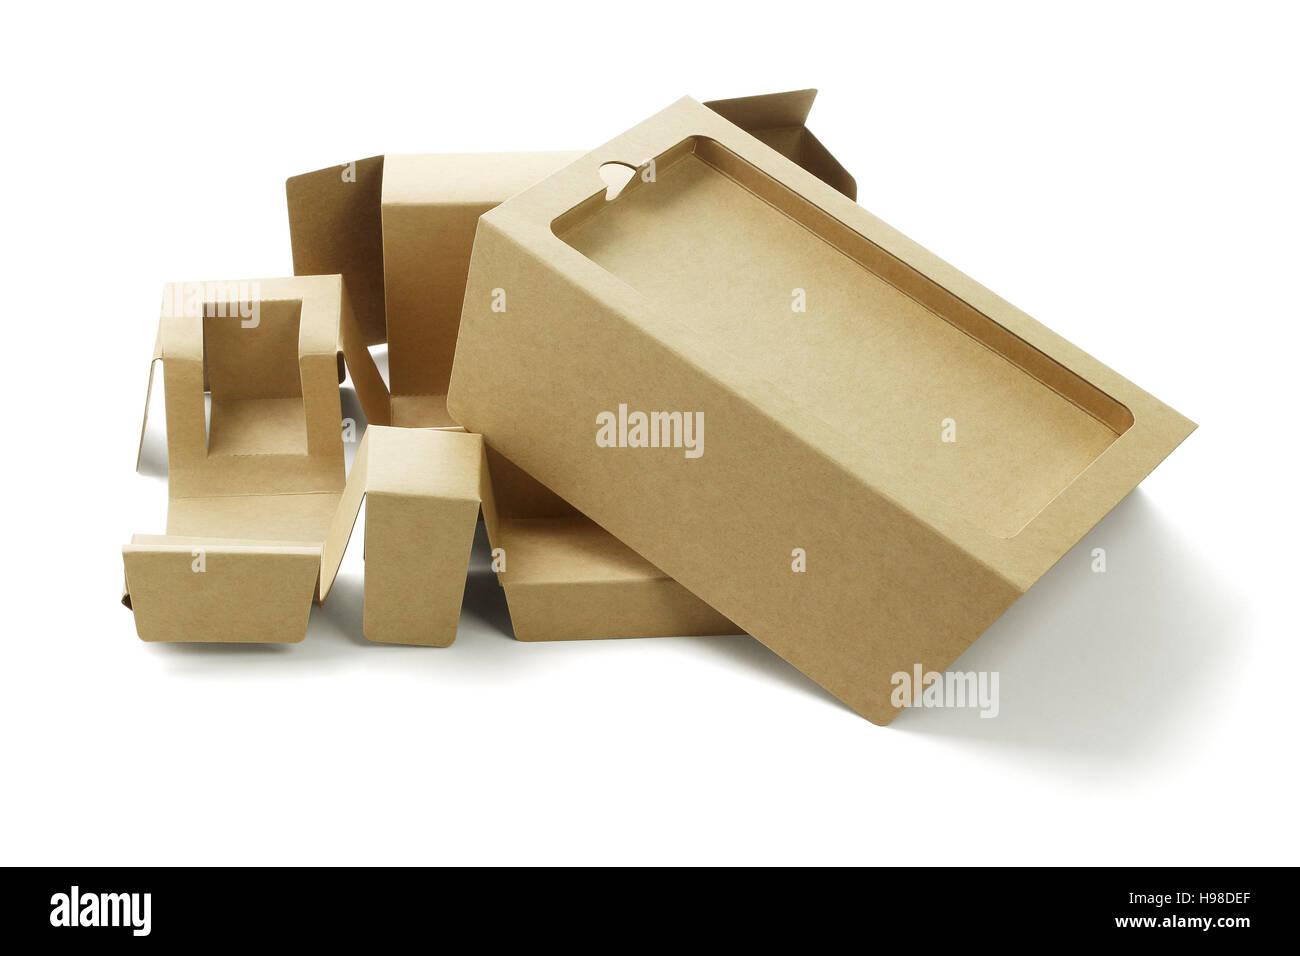 Smart Phone cartons d'emballage sur fond blanc Photo Stock